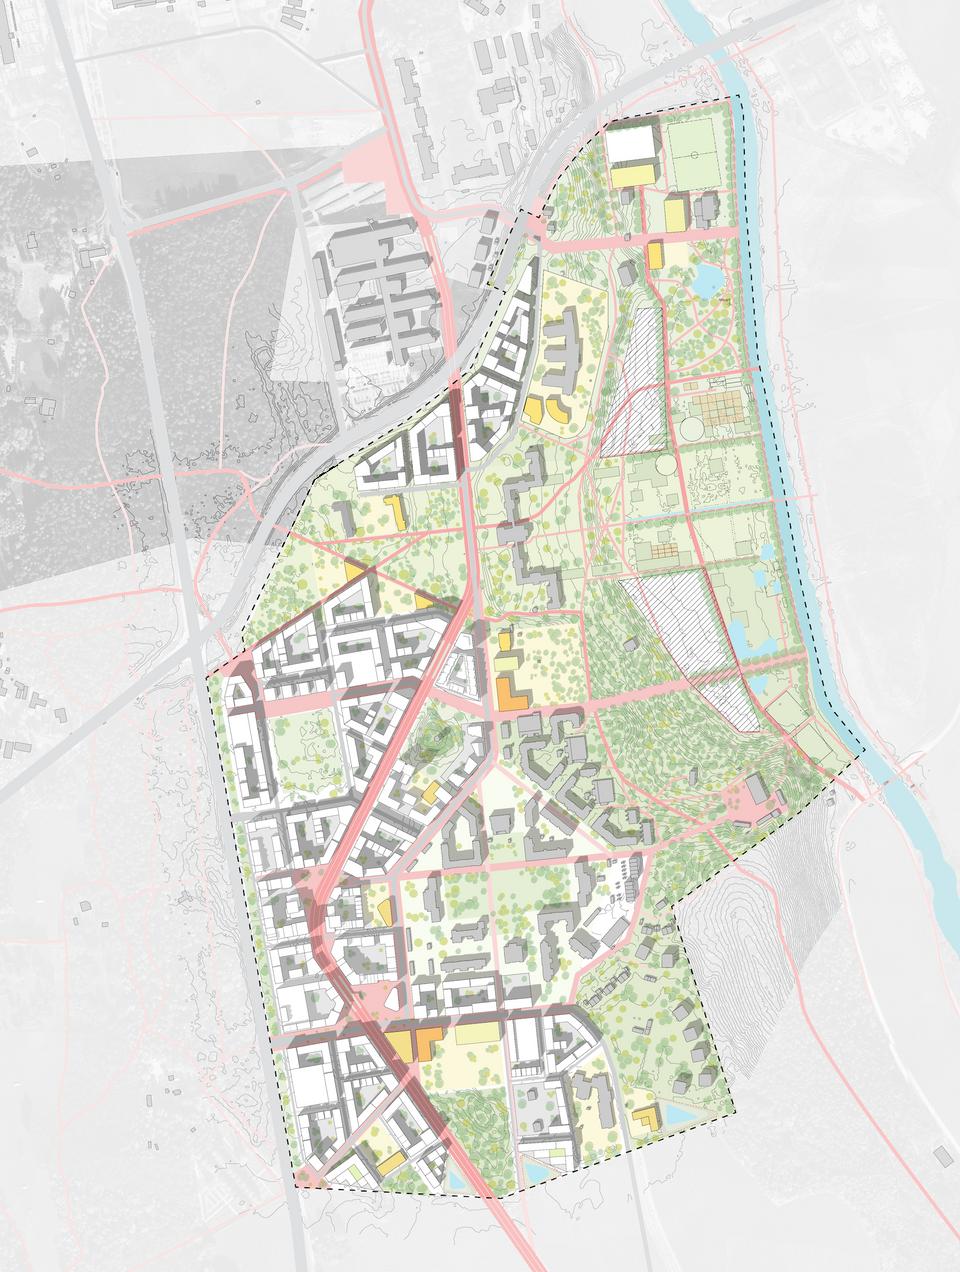 P01-078 Ulleraker_Plan 5000_LR.png